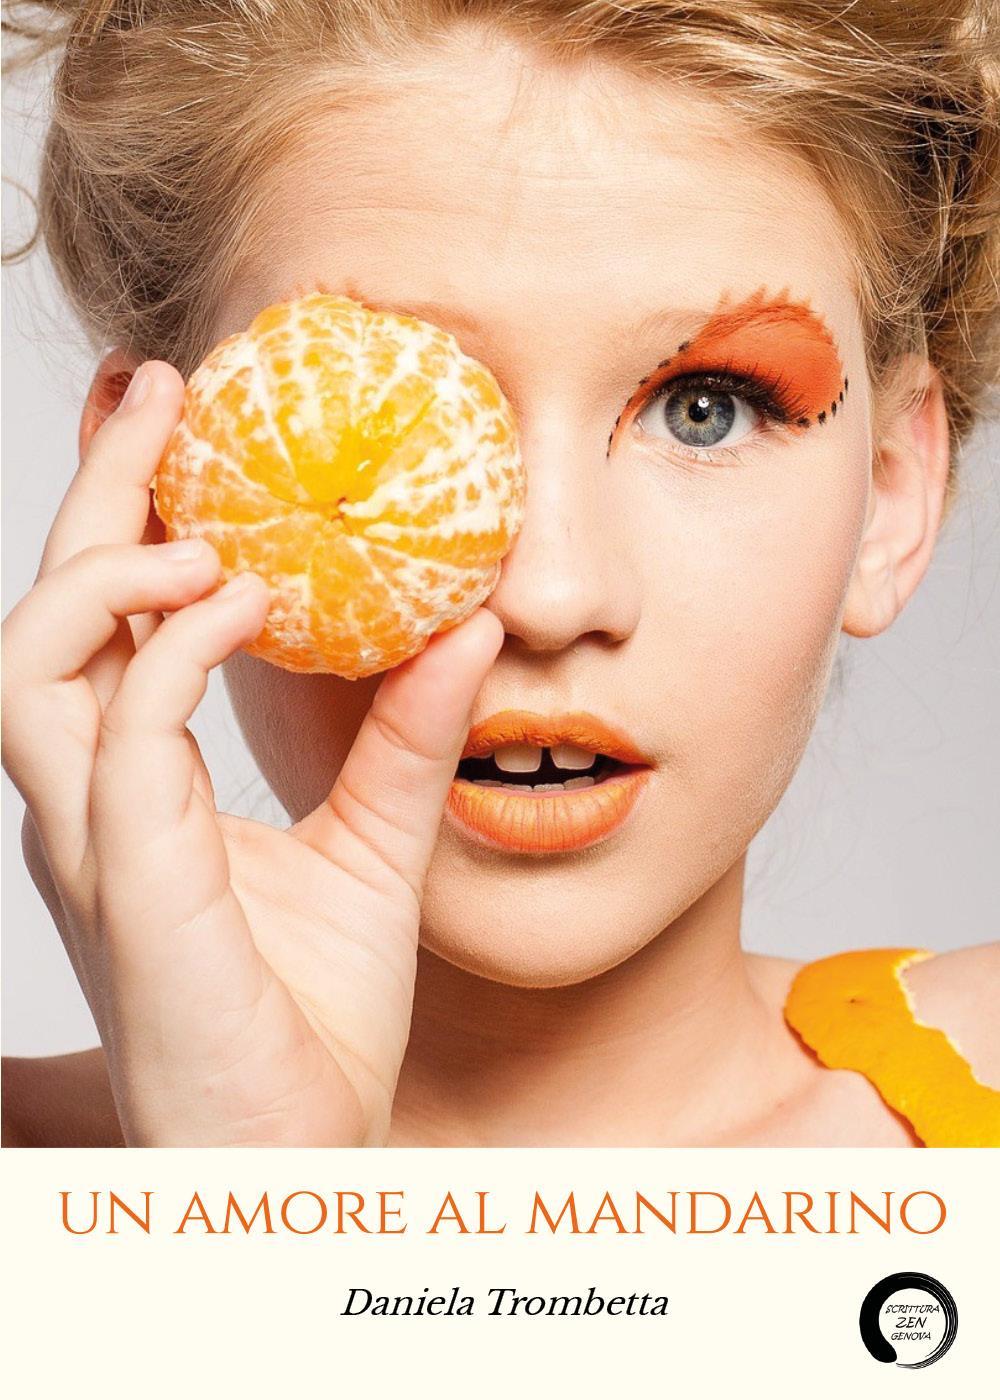 Un amore al mandarino